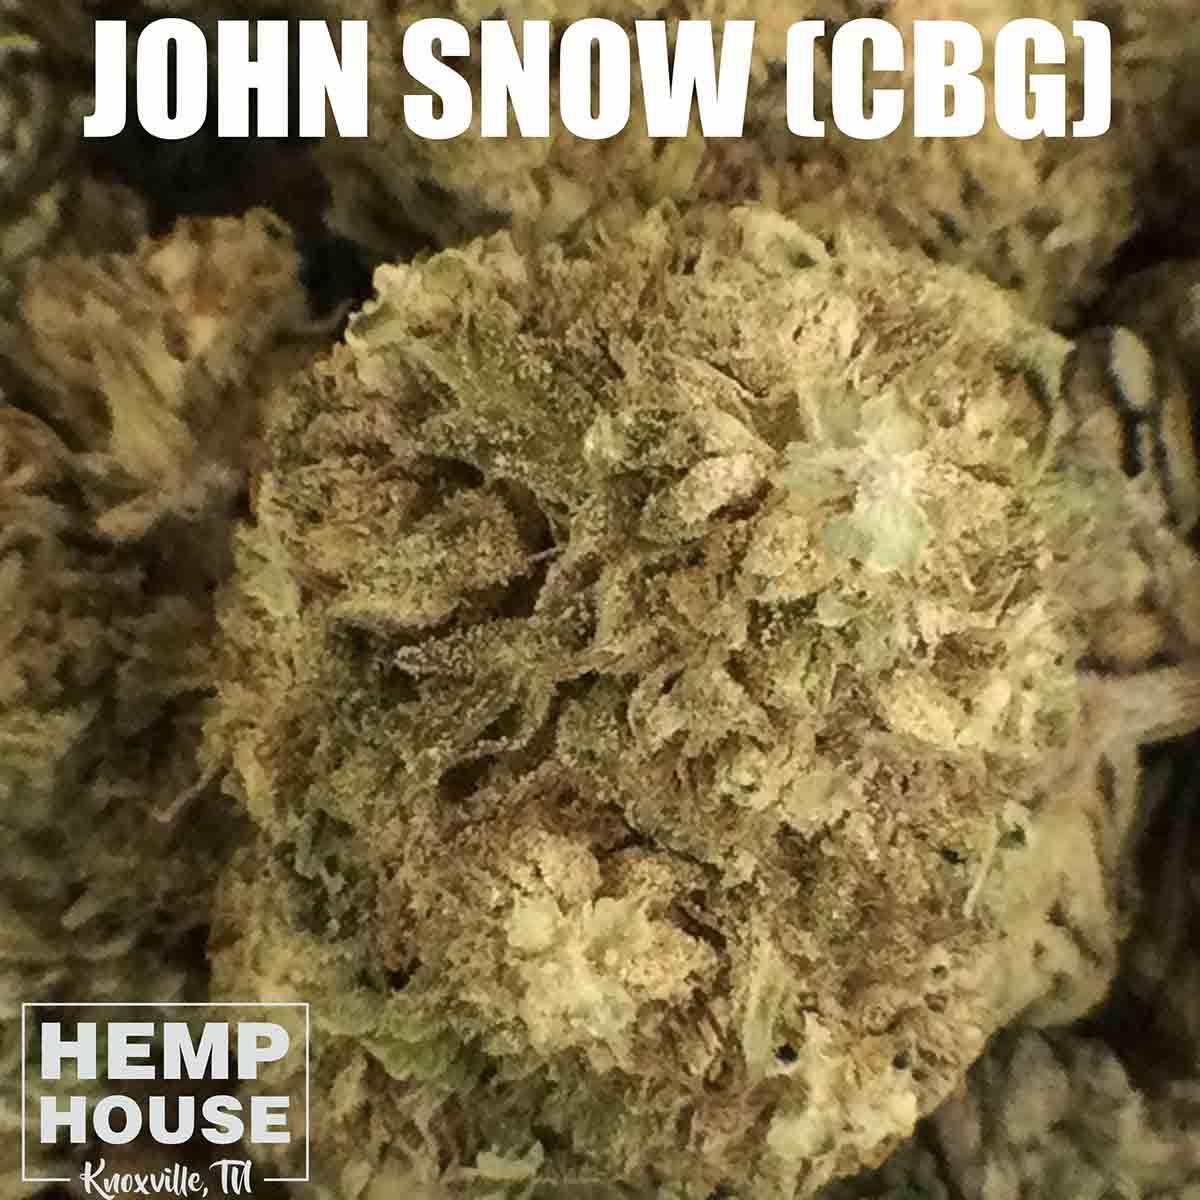 john snow cbg hemp flower near me knoxville tn hemp house cbd near me